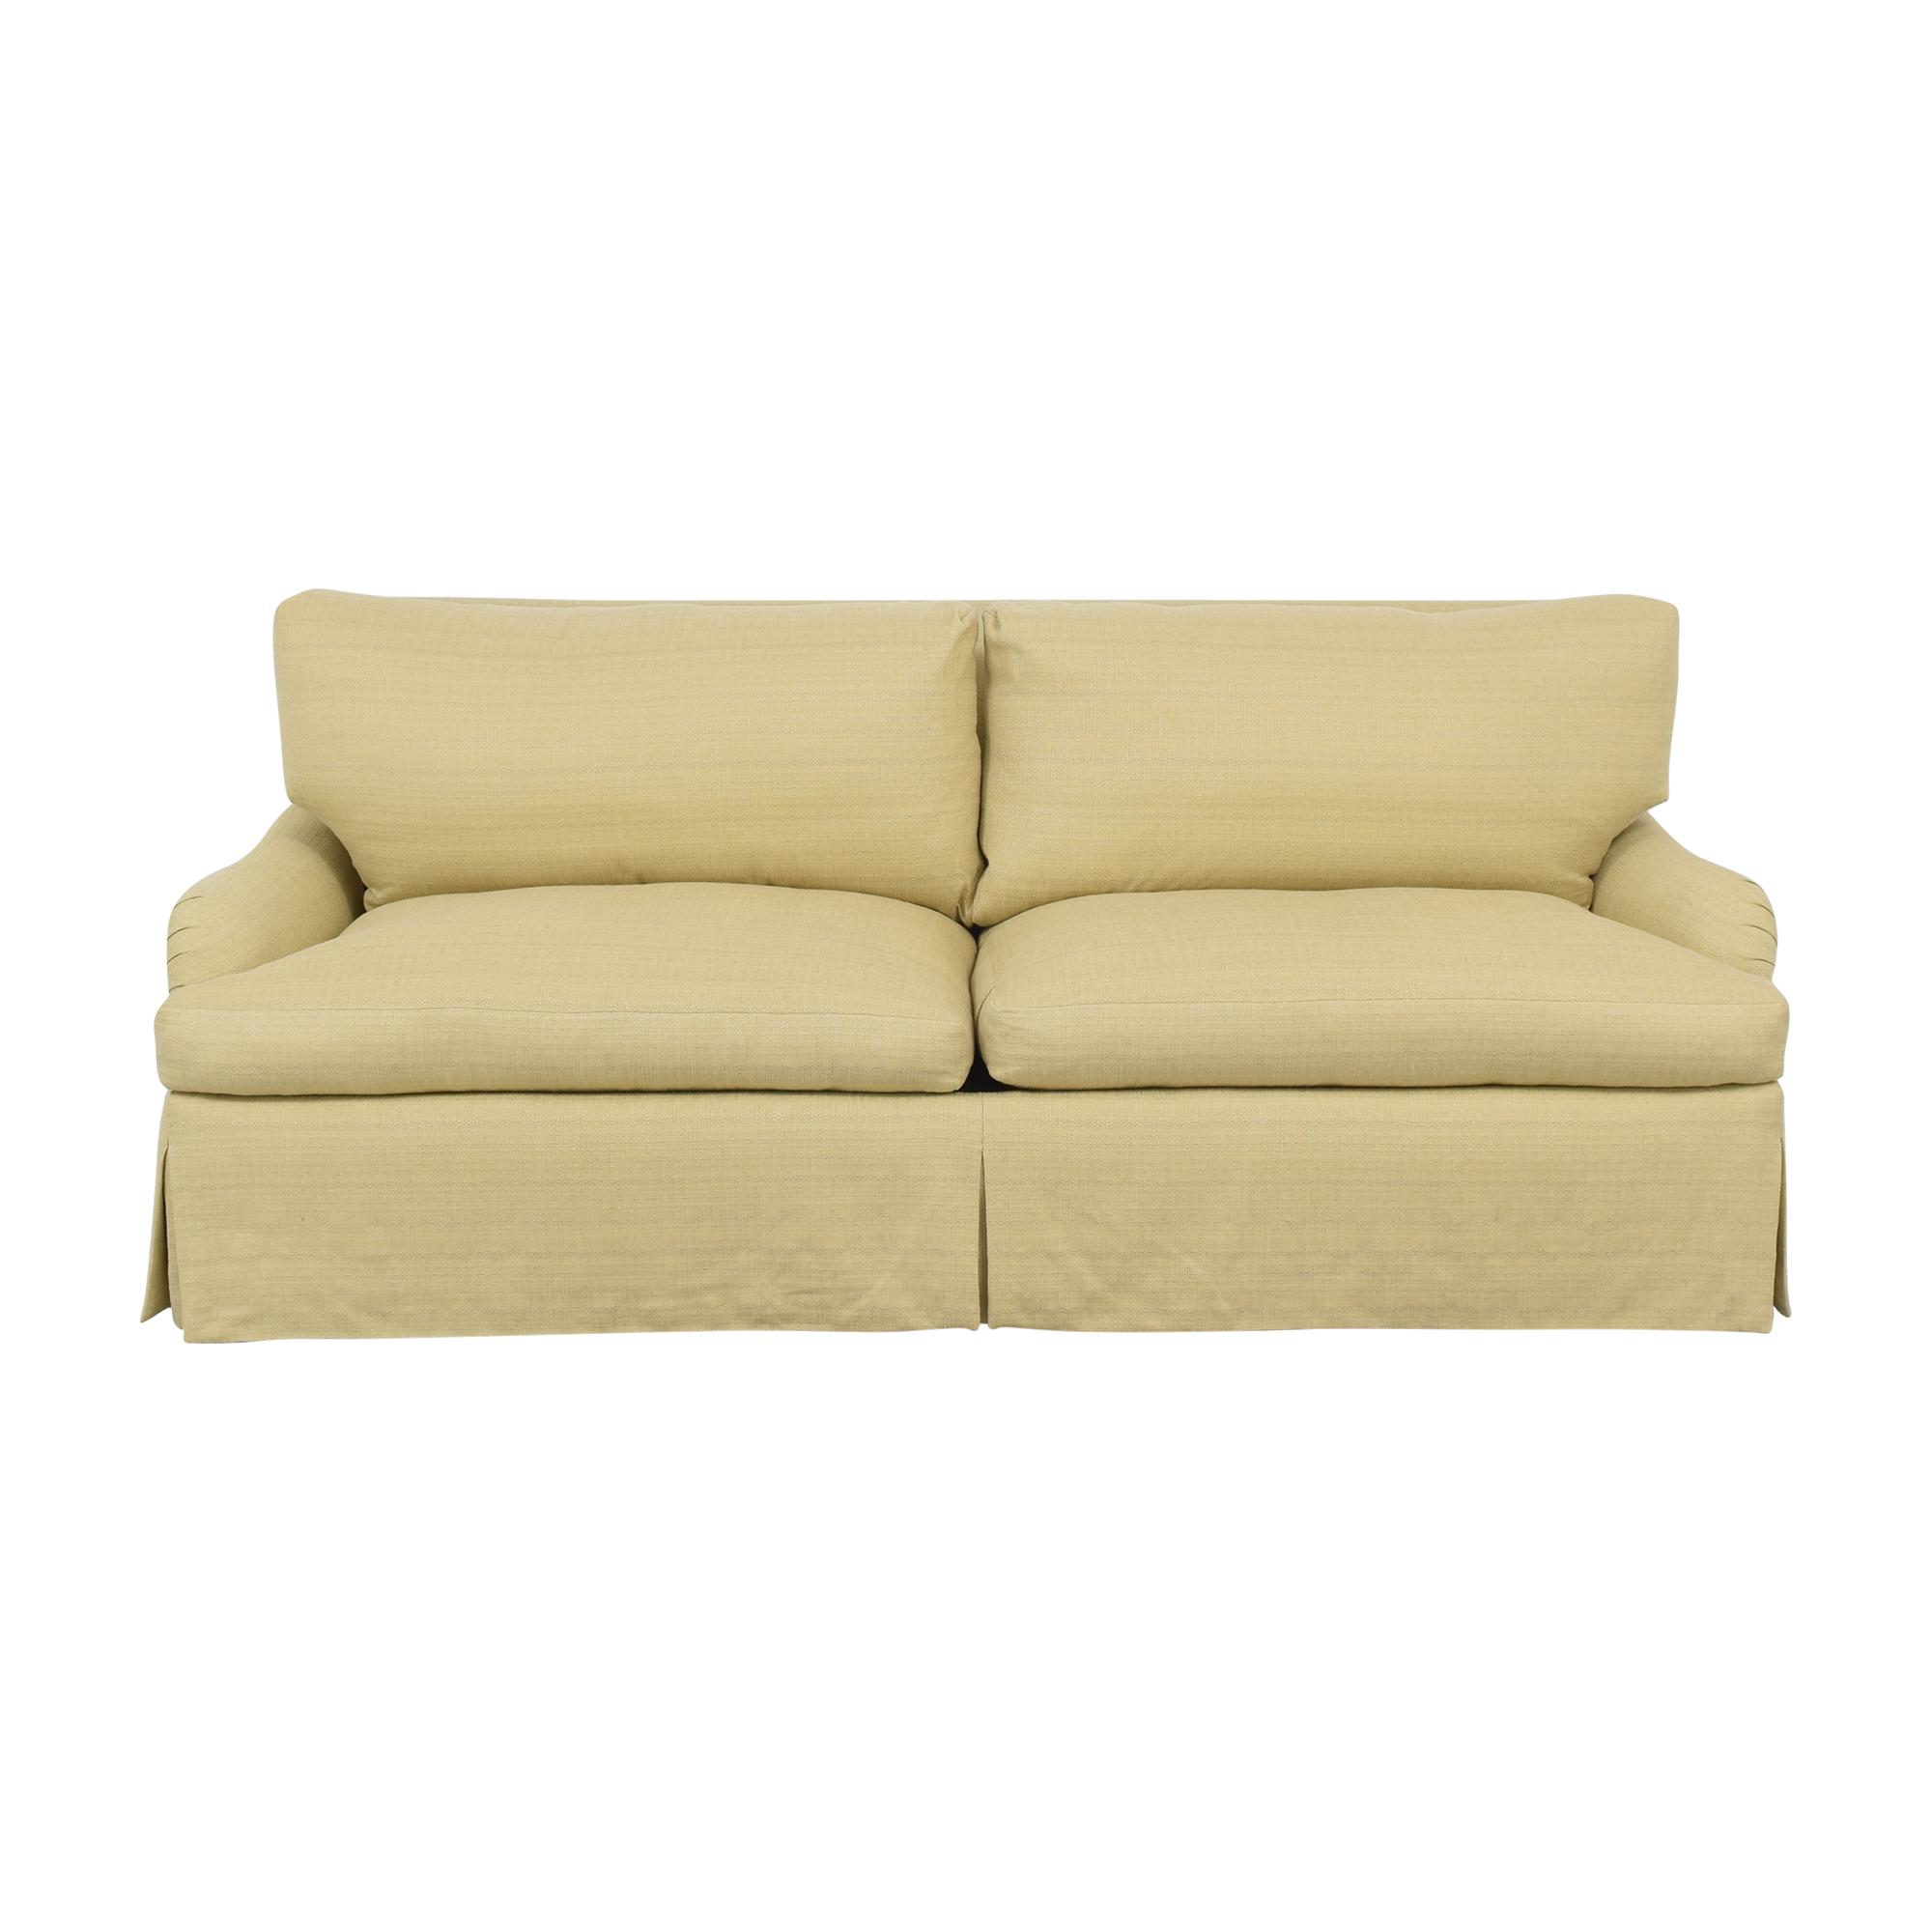 Custom Down Sofa nj